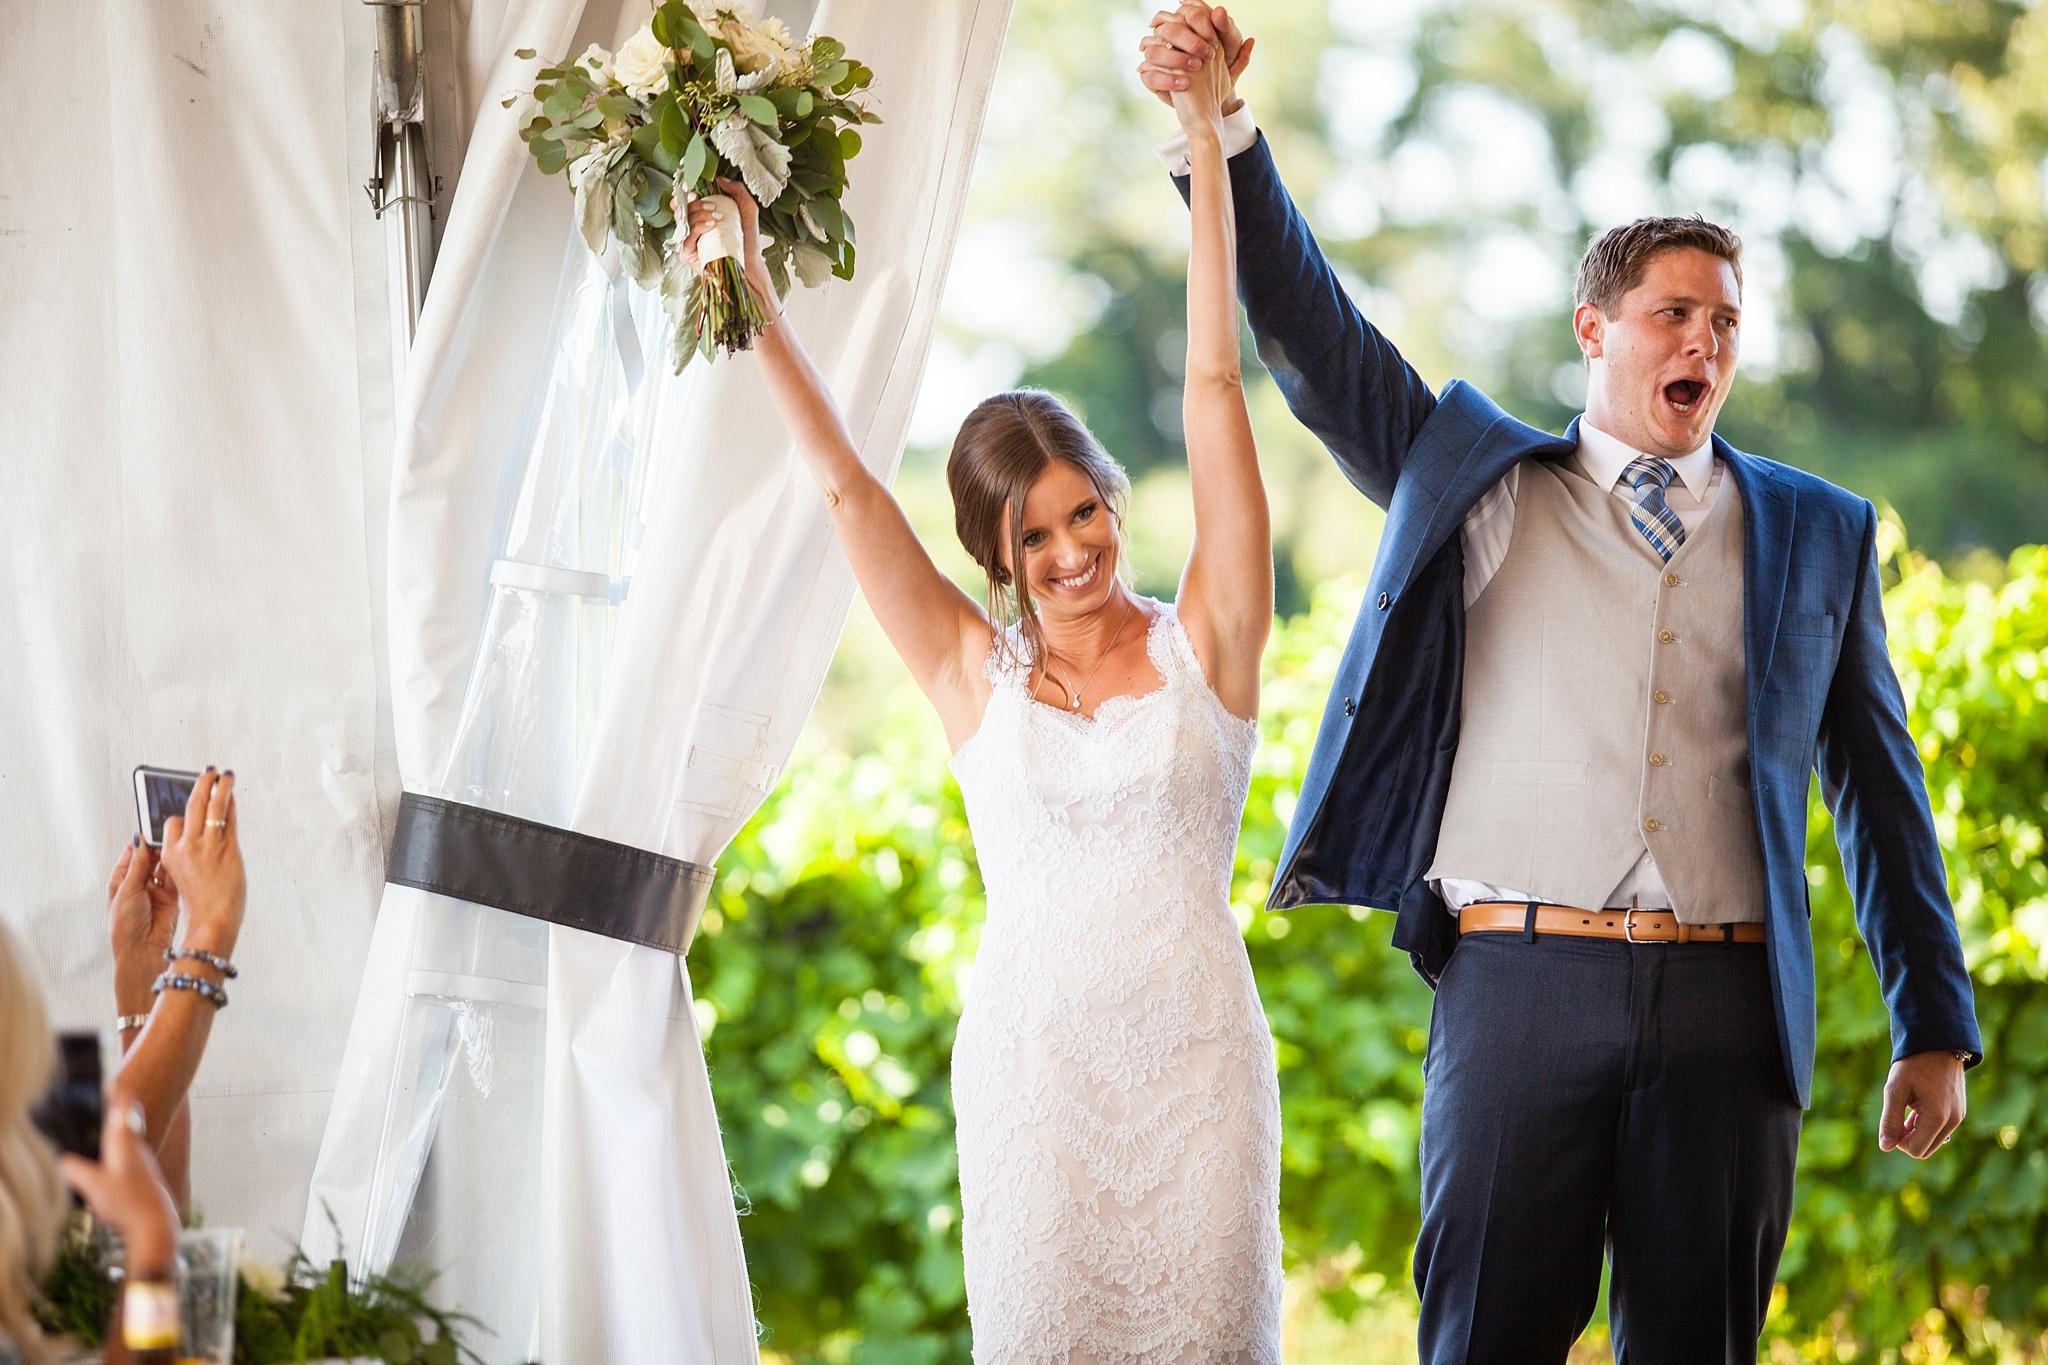 Tim&Polly_Wedding_12CornerVineyard_blog075.jpg